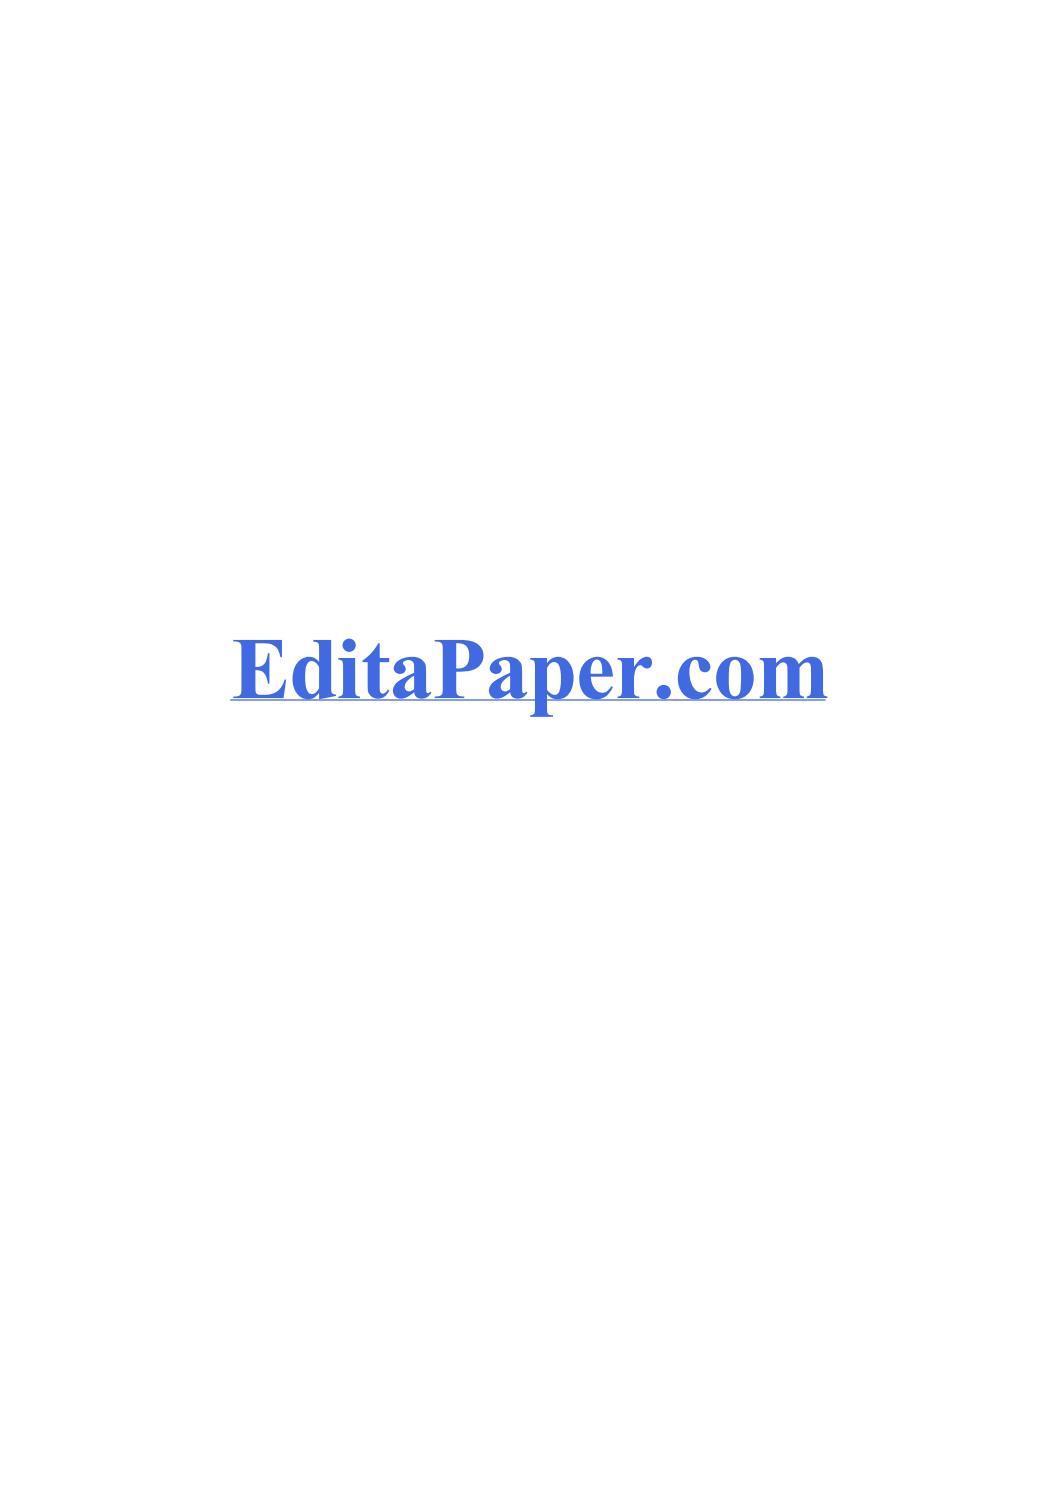 Professional custom essay writers service